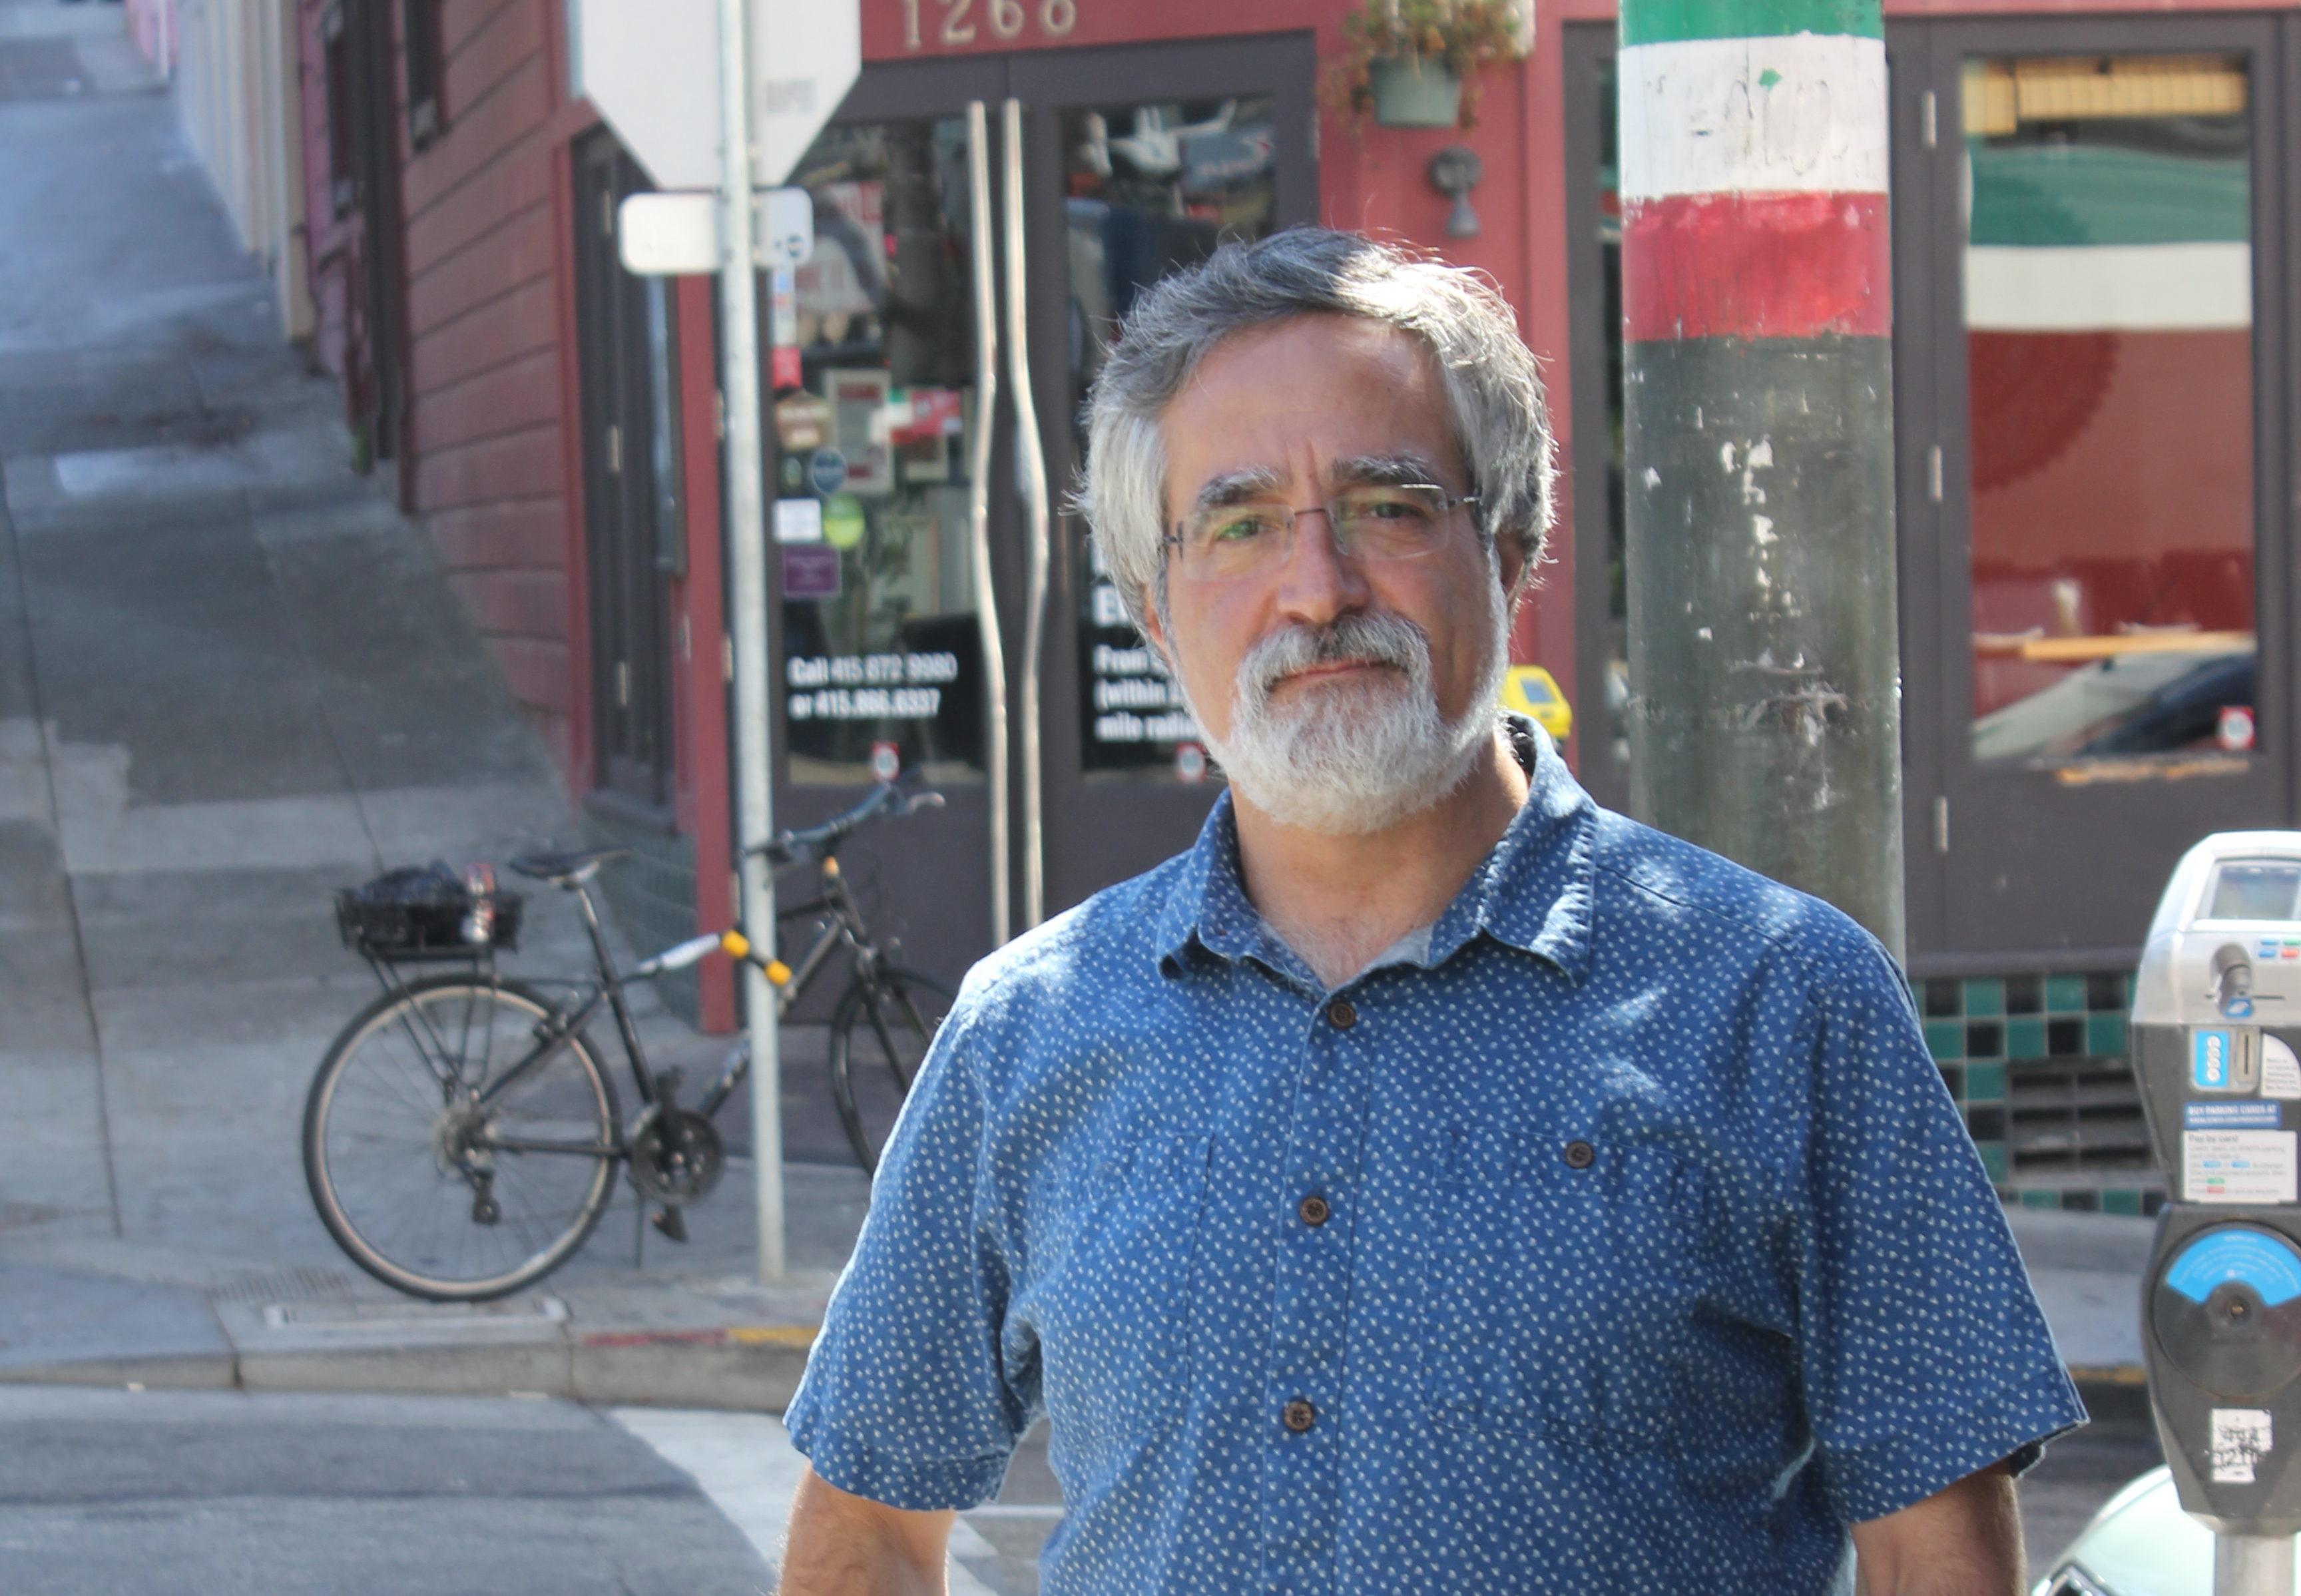 San Francisco Supervisor Aaron Peskin outside Caffe Trieste in North Beach (Photo/David A.M. Wilensky)